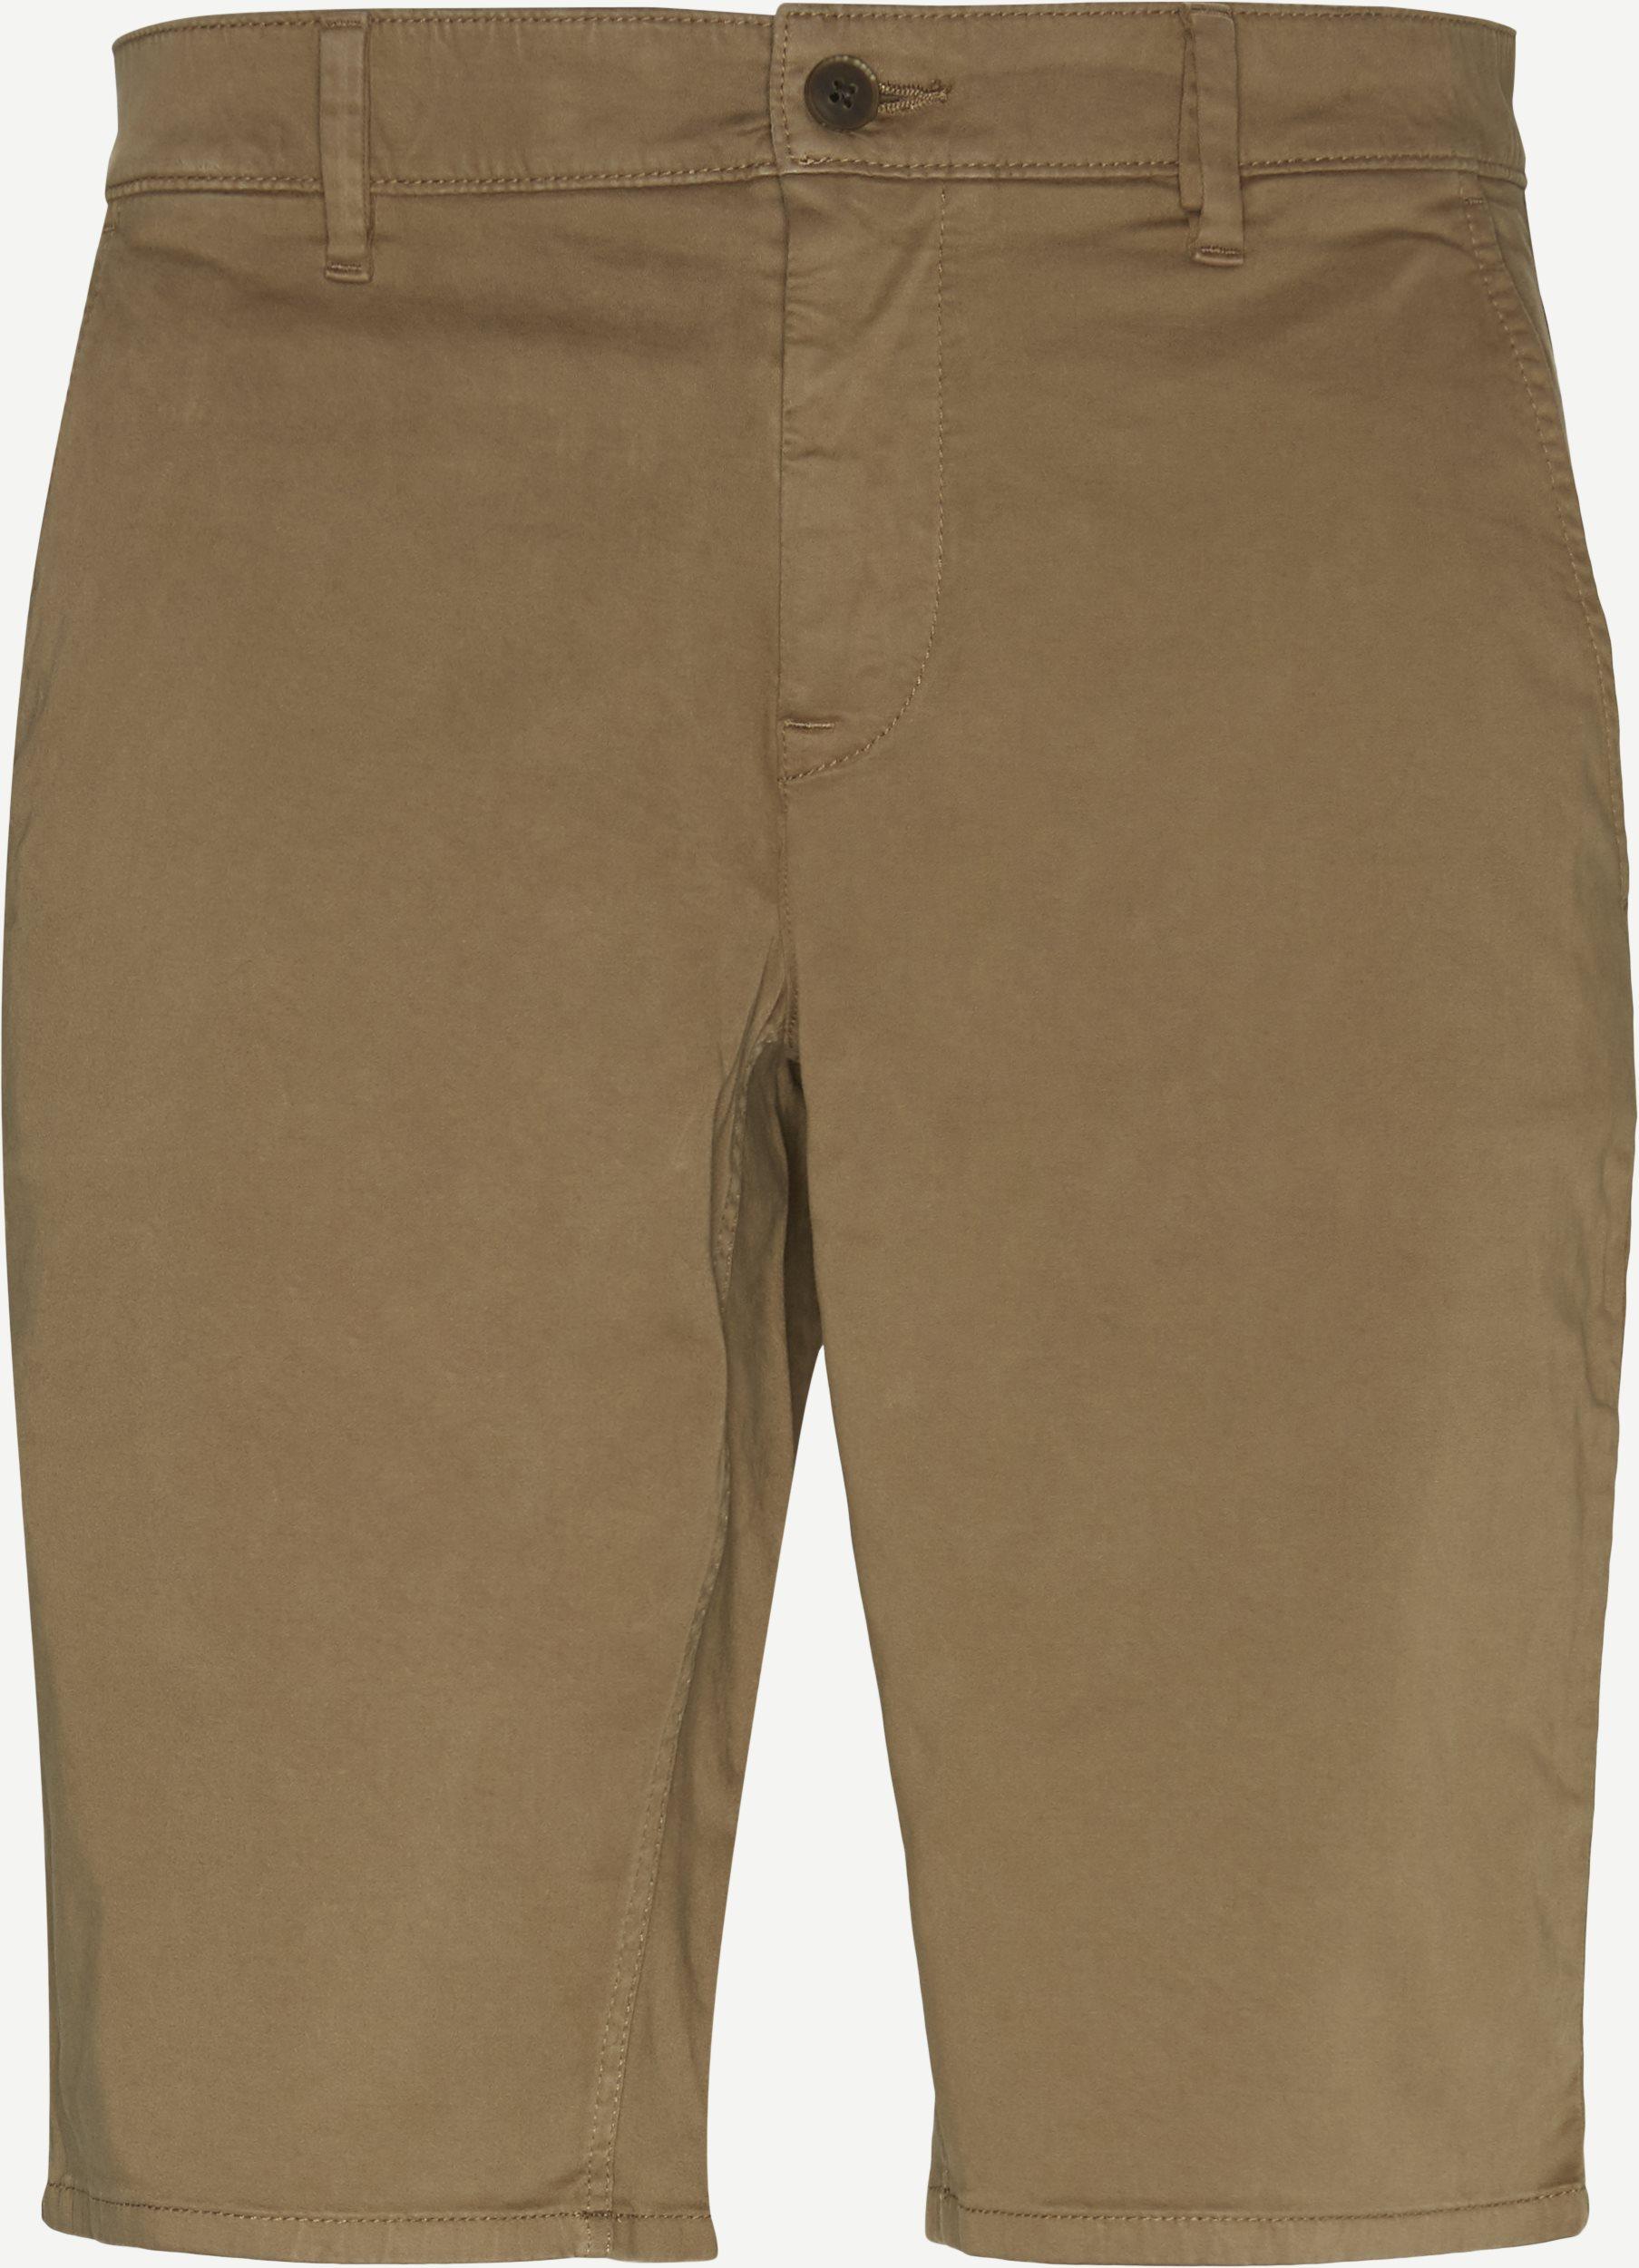 Shorts - Slim - Brown